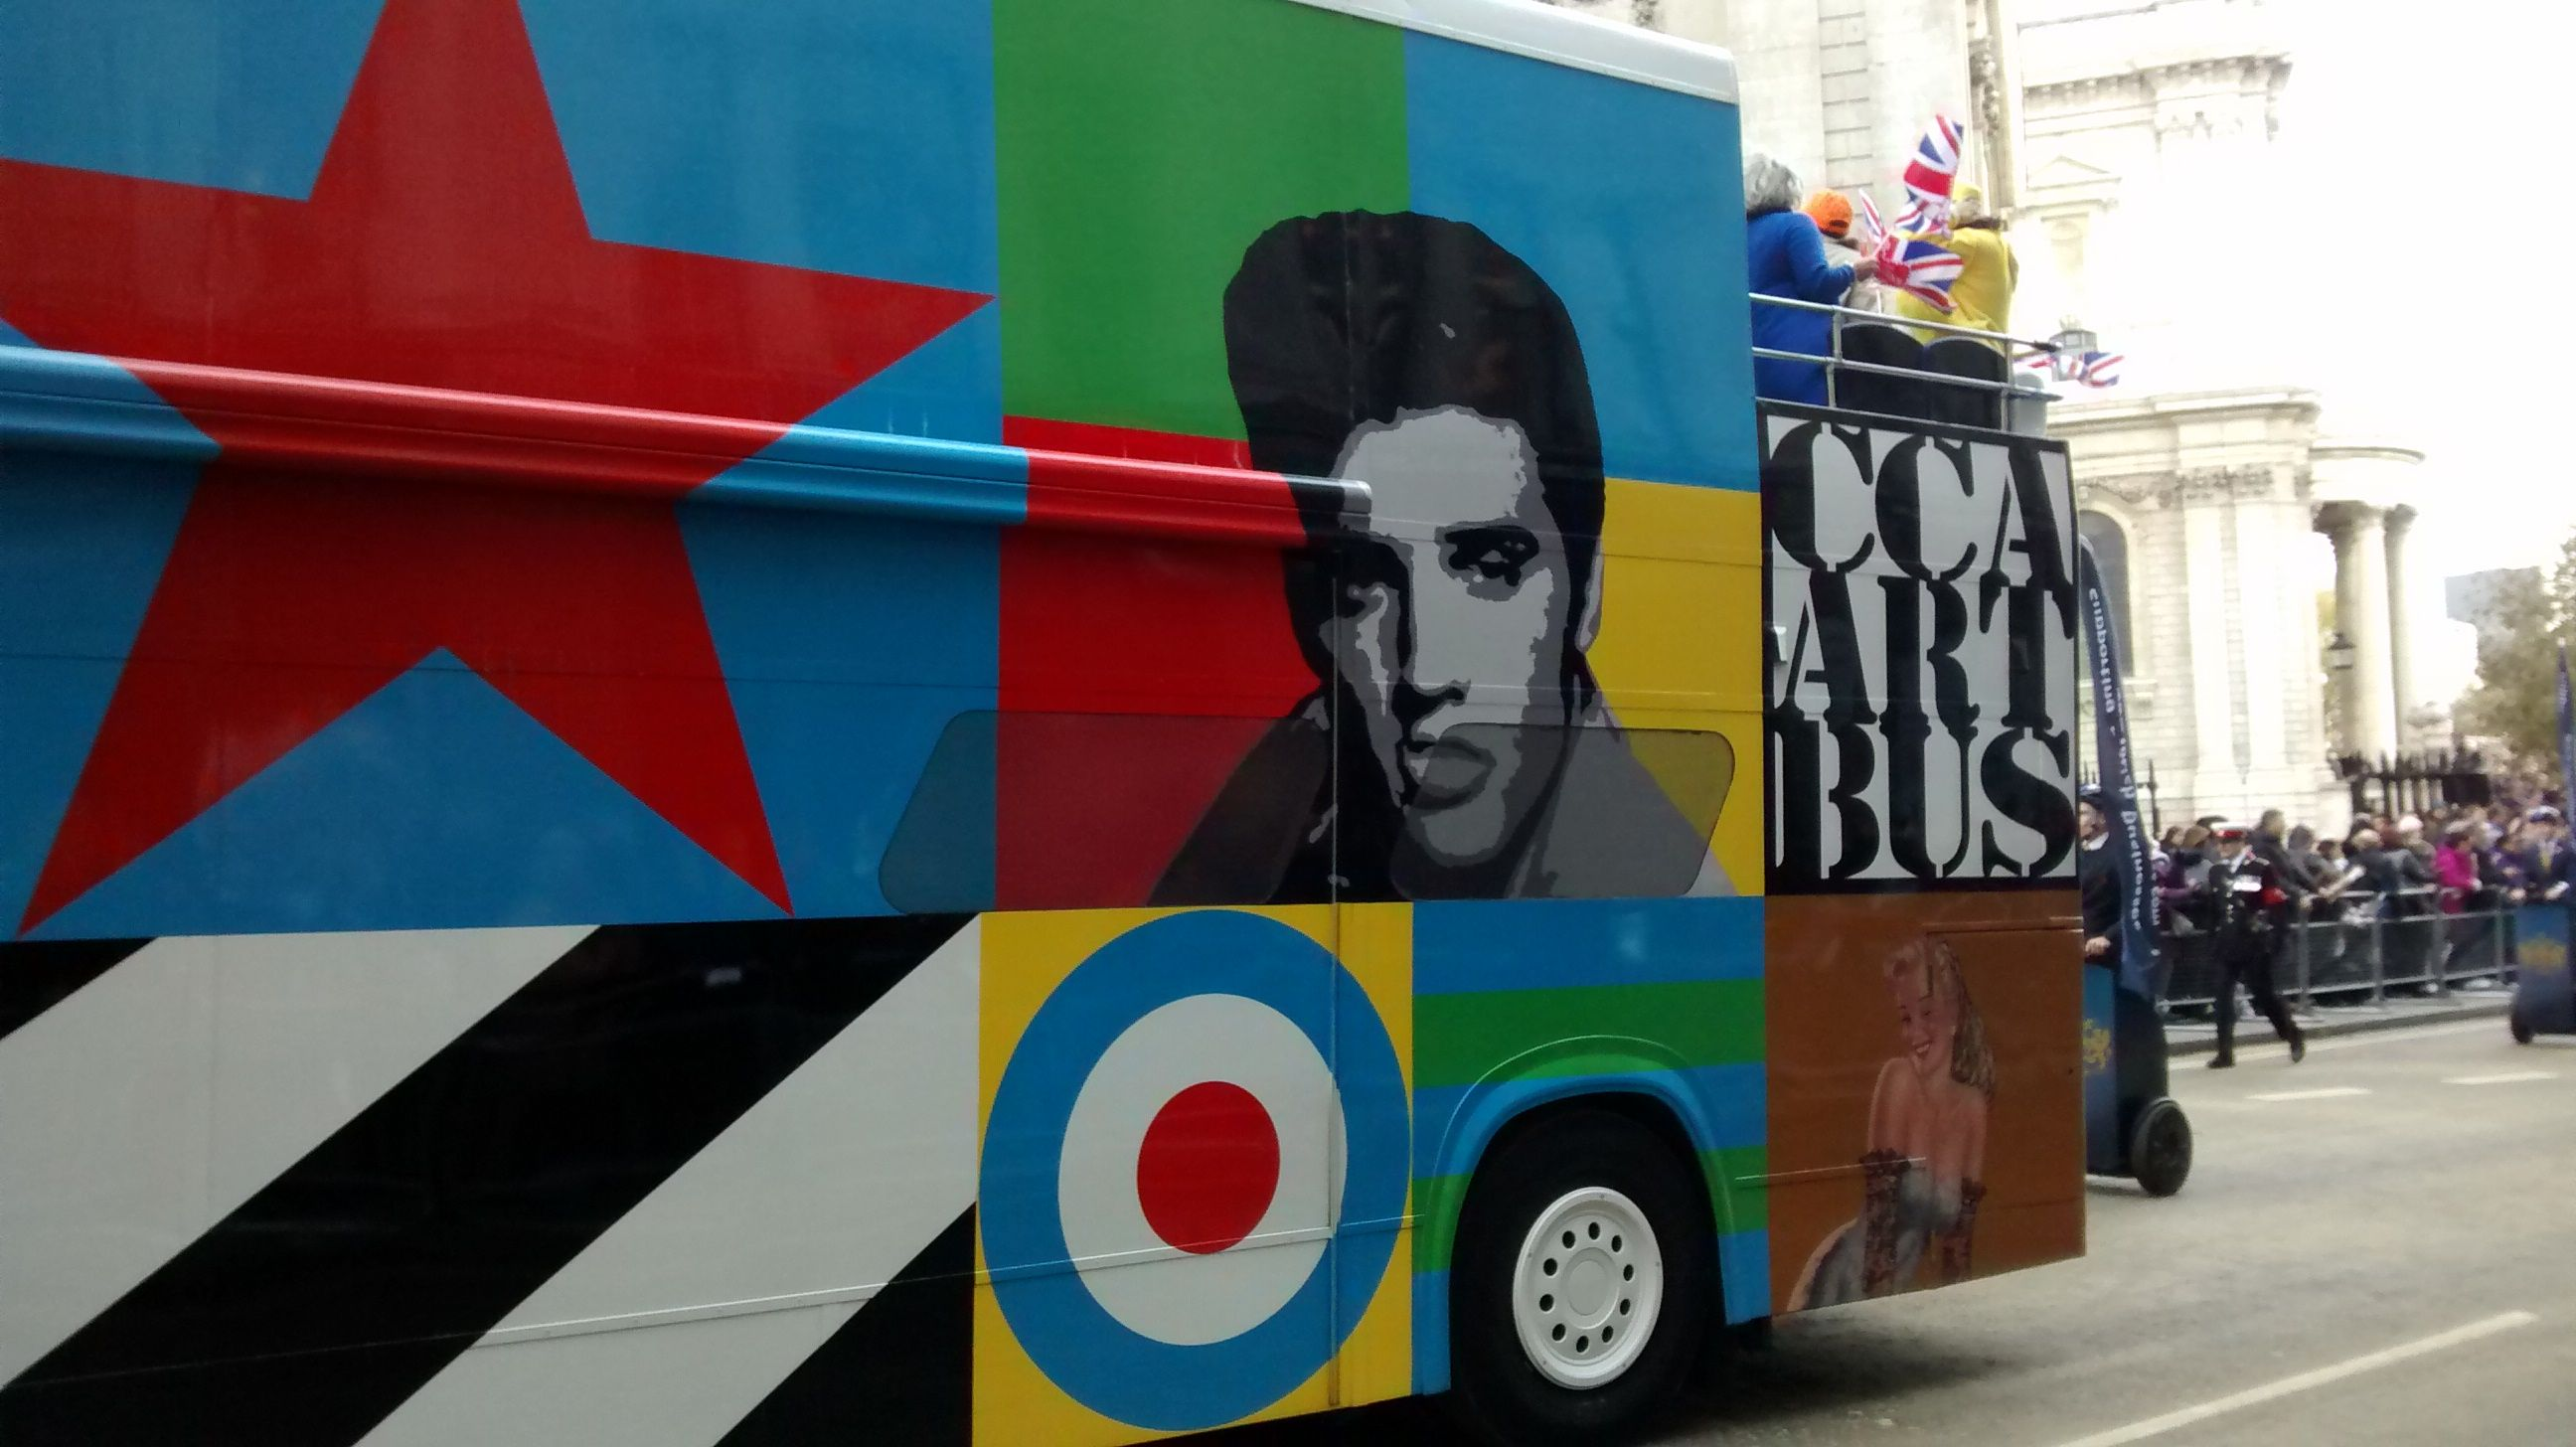 Royal College of Art London 2014